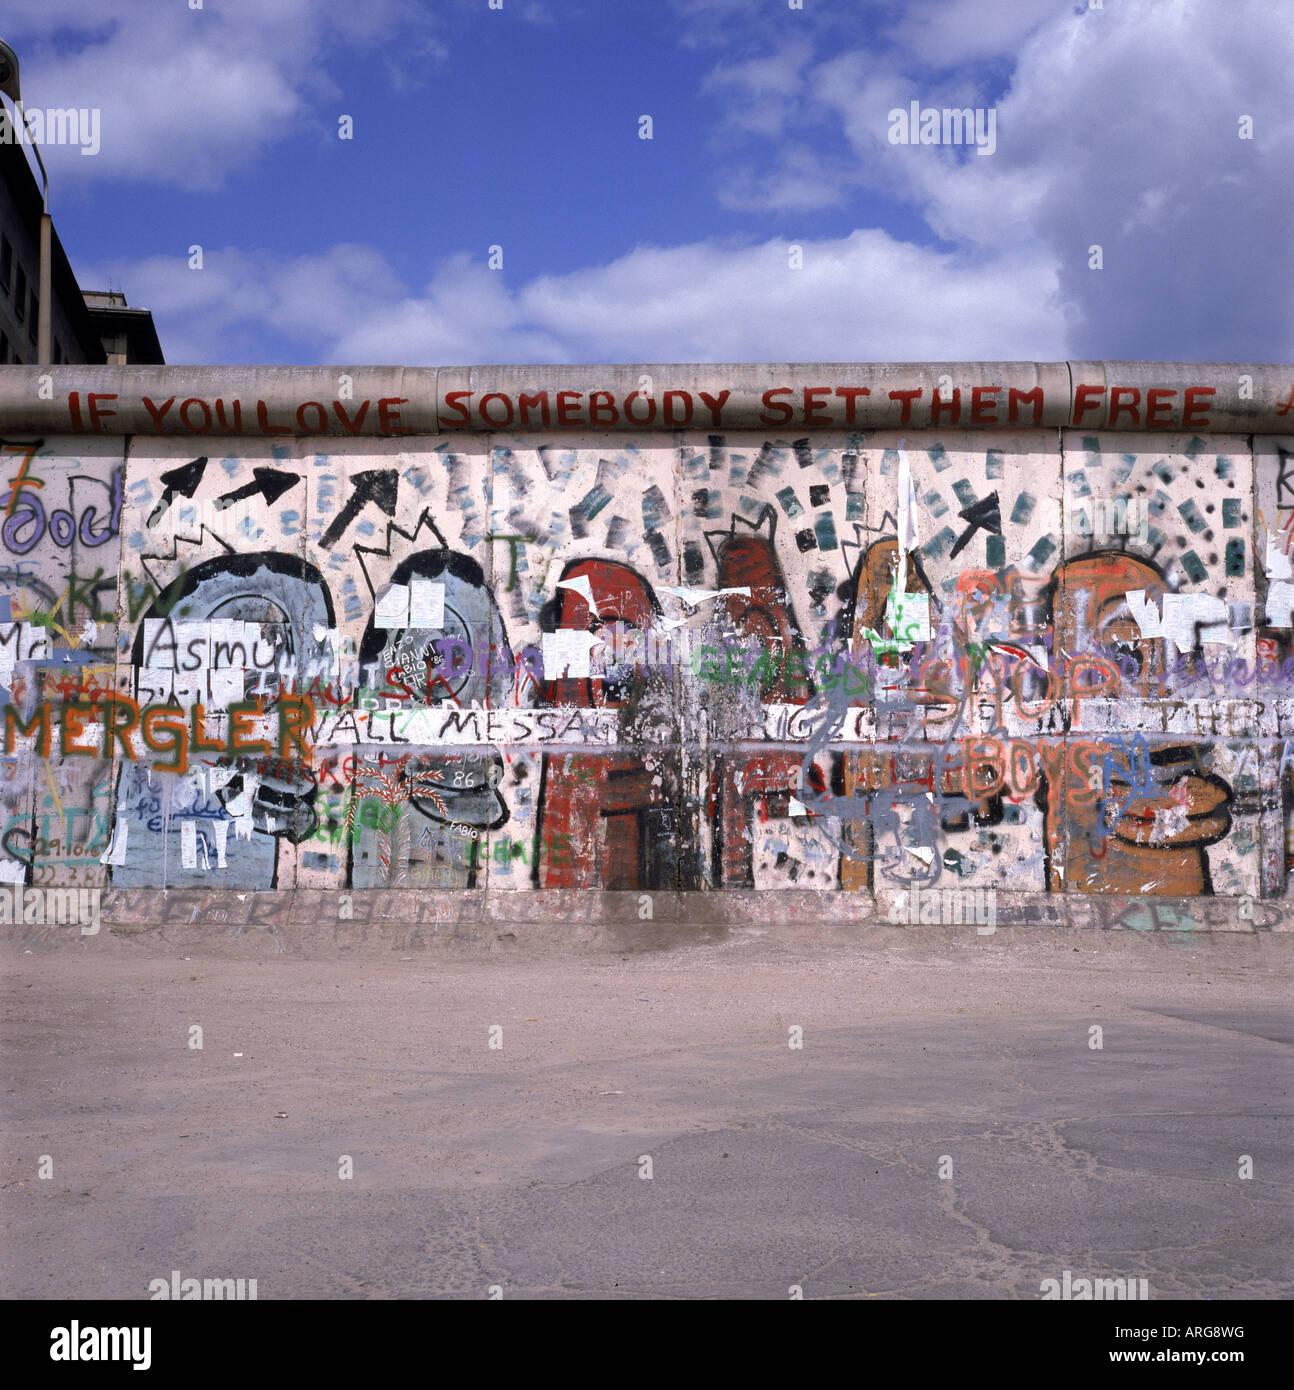 berlin-wall-intra-german-frontier-ARG8WG